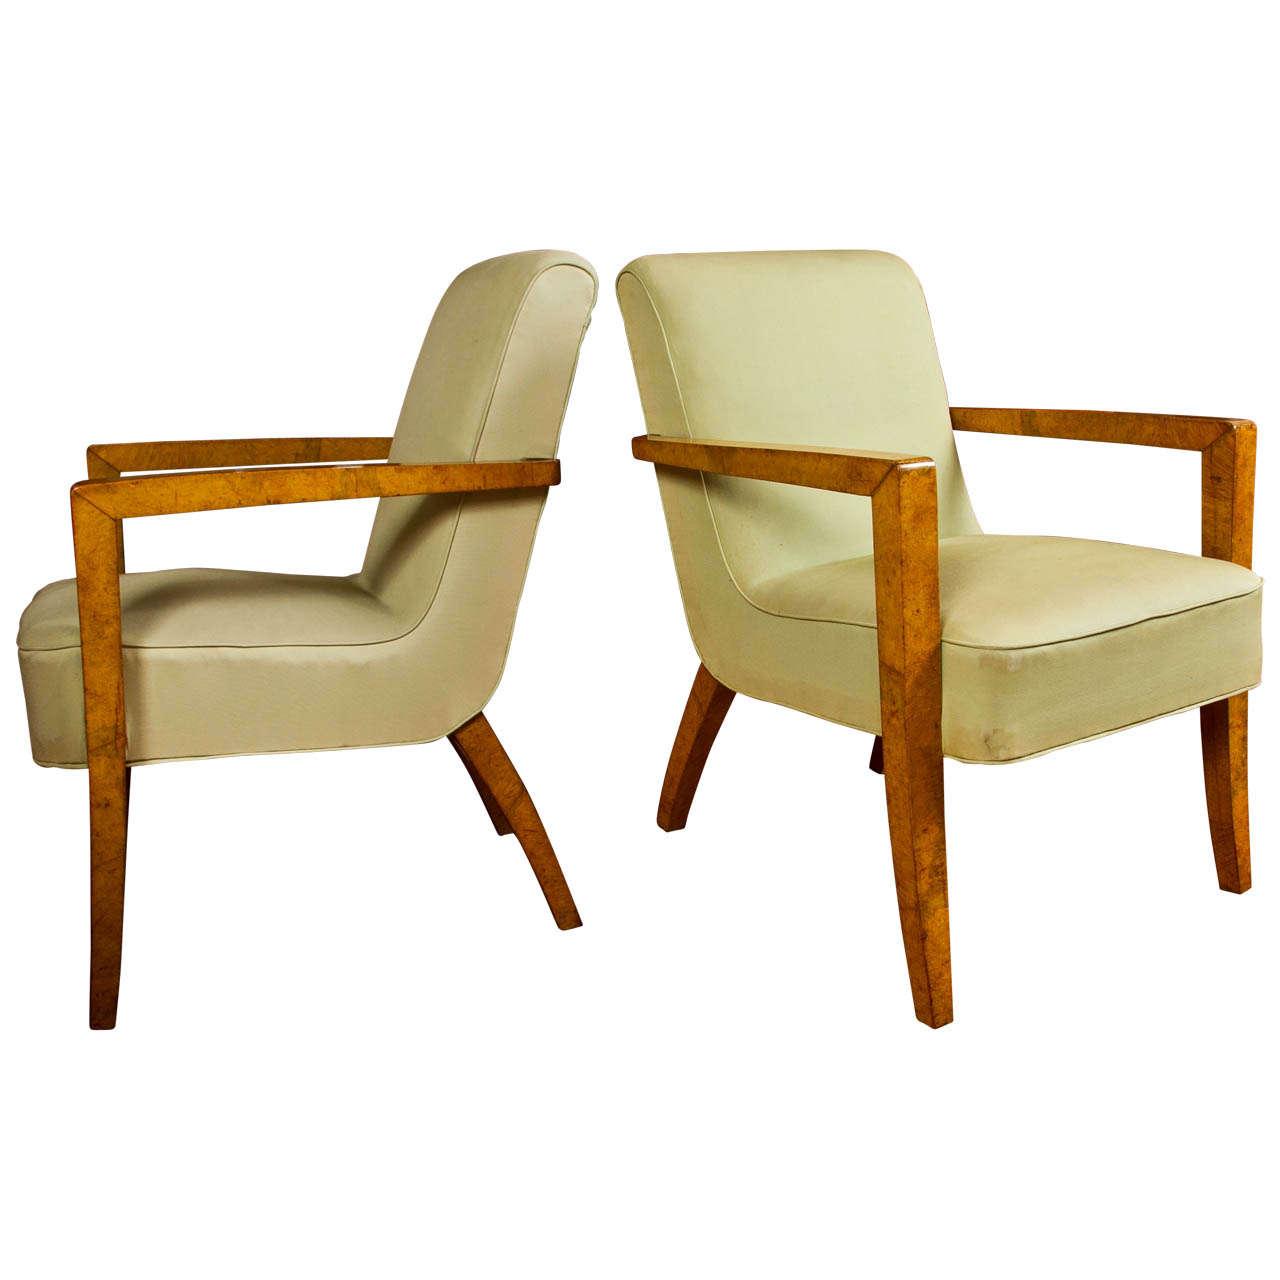 Large Pair of Italian designed Armchairs